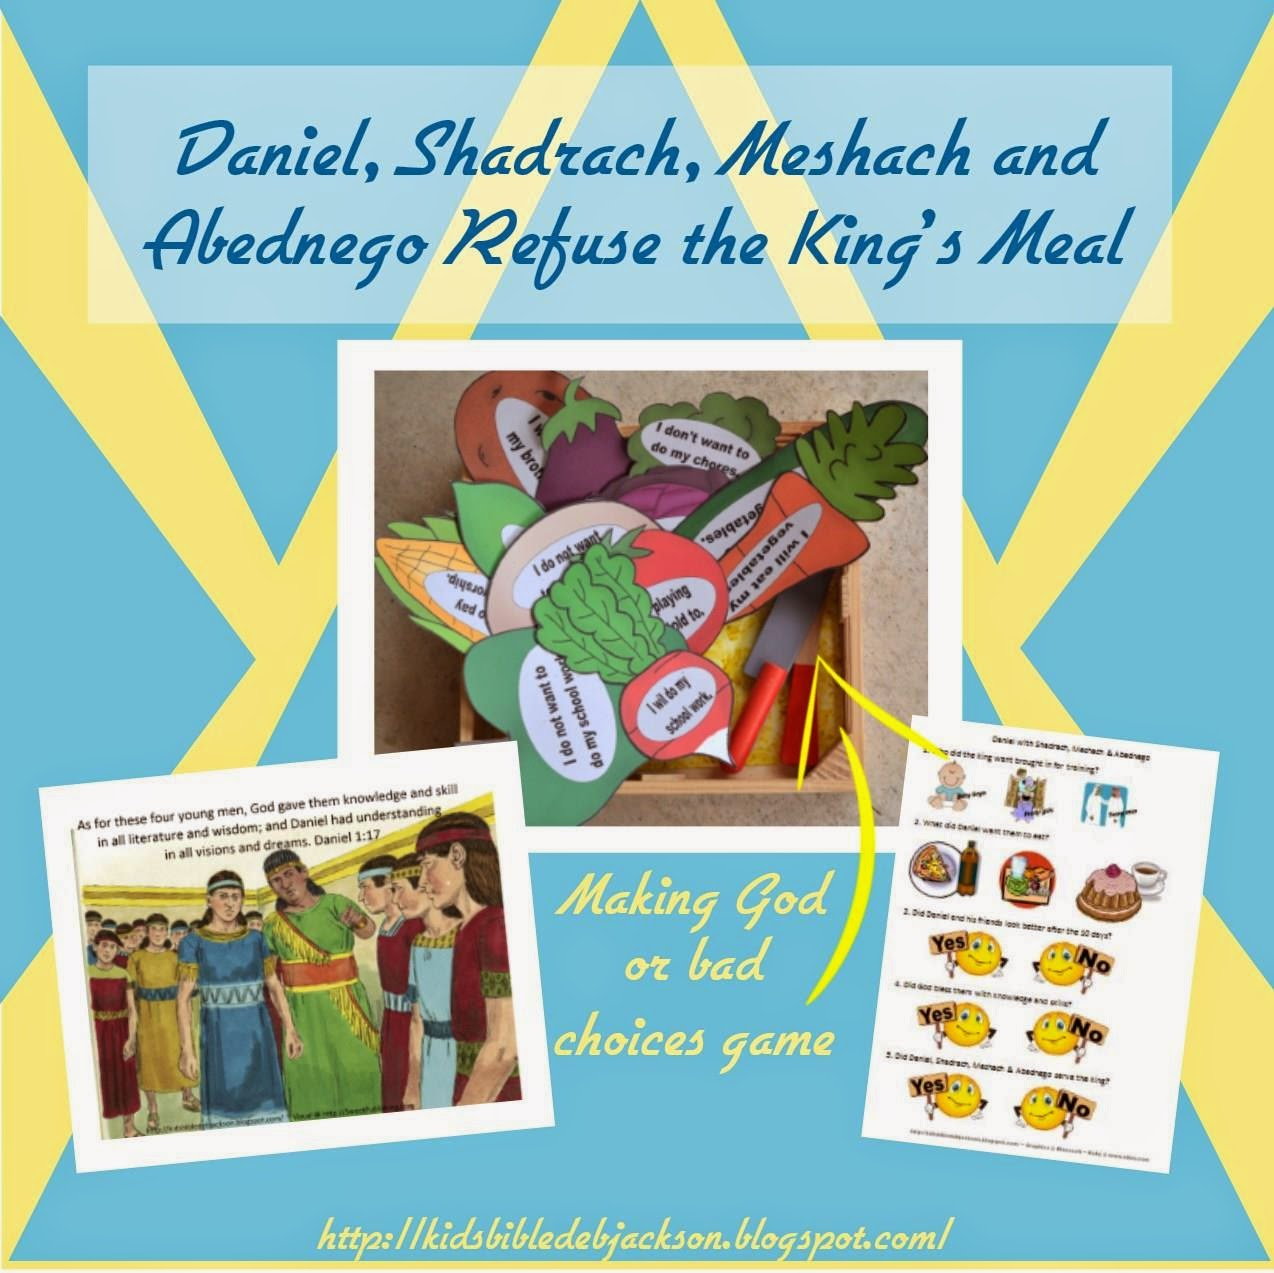 http://kidsbibledebjackson.blogspot.com/2014/05/daniel-shadrach-meshach-and-abednego.html